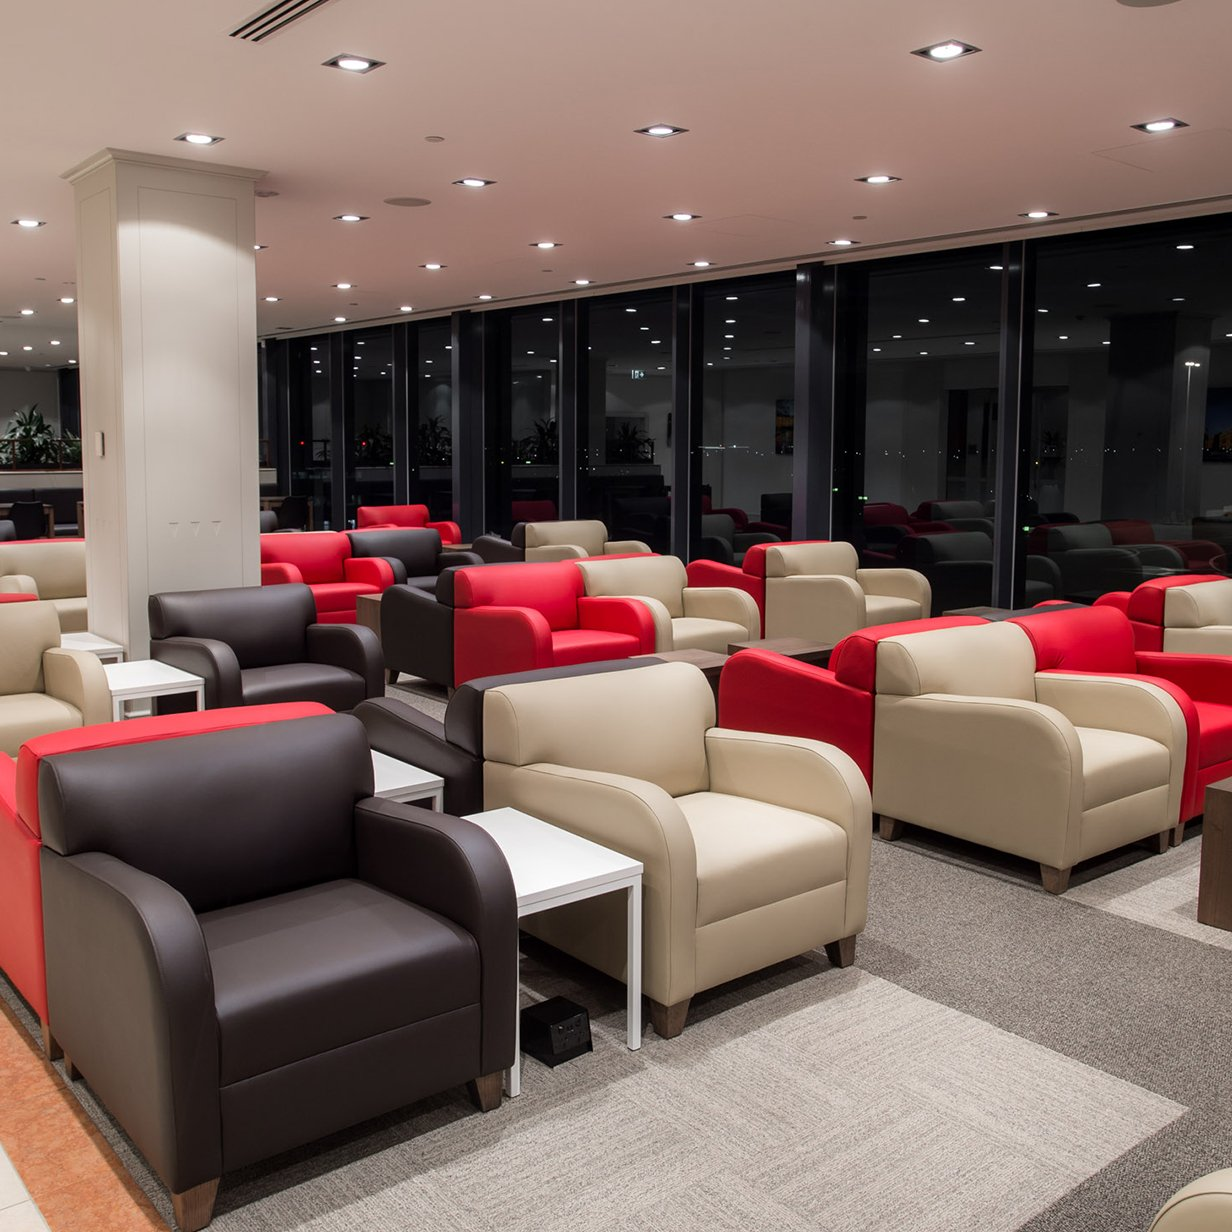 Melbourne Airport Lounge Access | Australia | marhaba Services